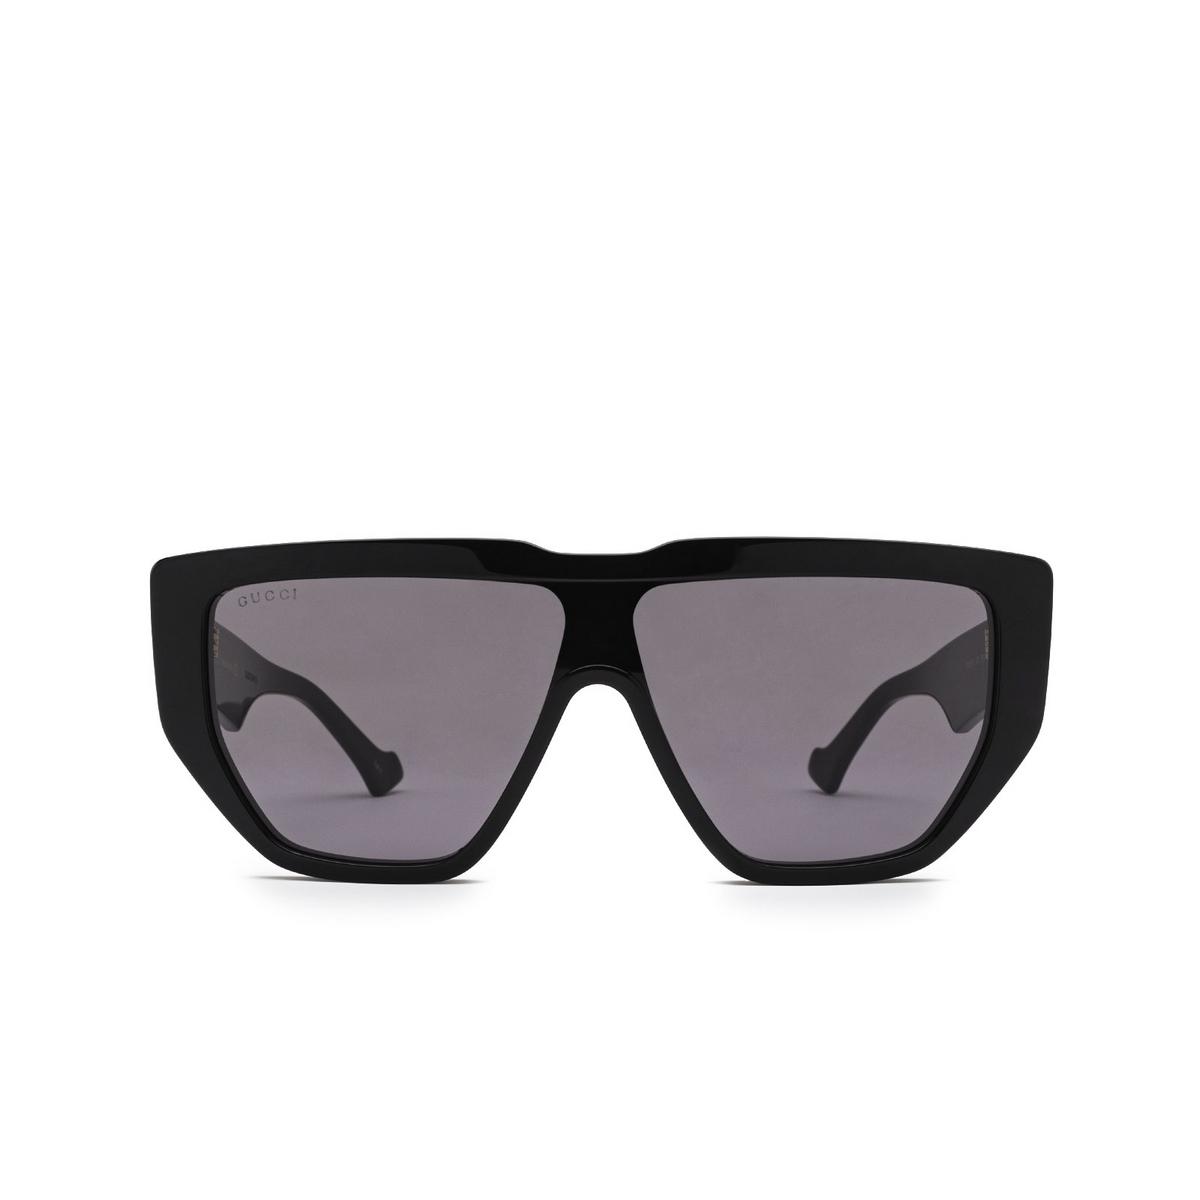 Gucci® Mask Sunglasses: GG0997S color Black 002 - front view.